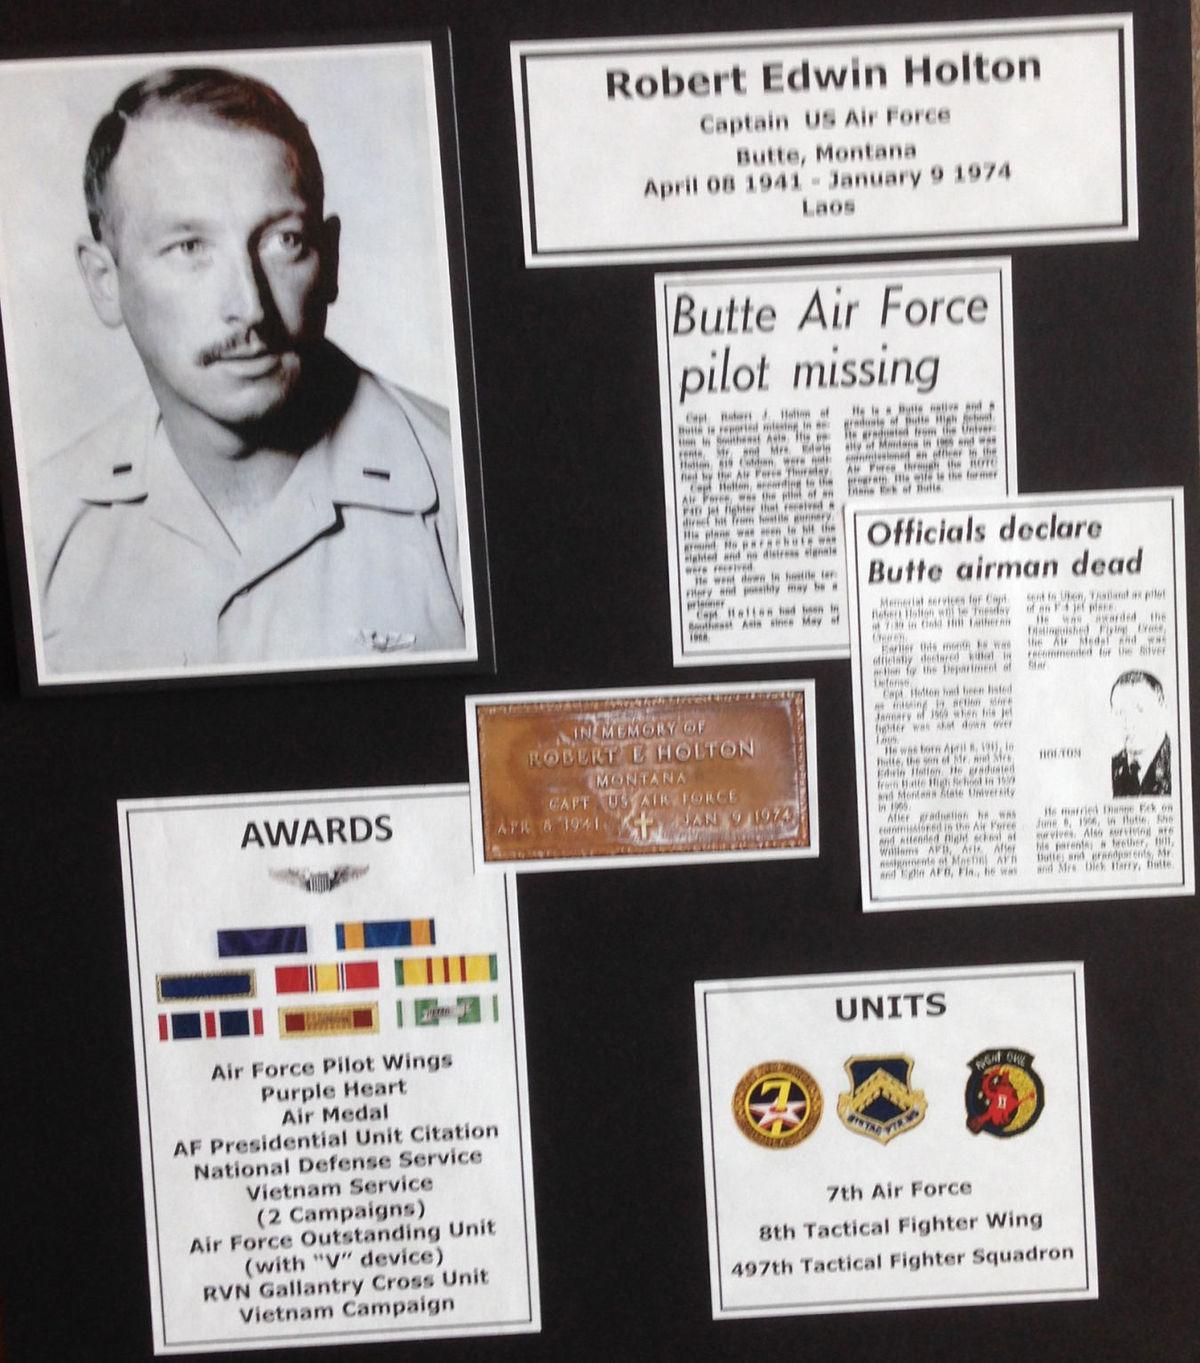 Veterans' exhibit